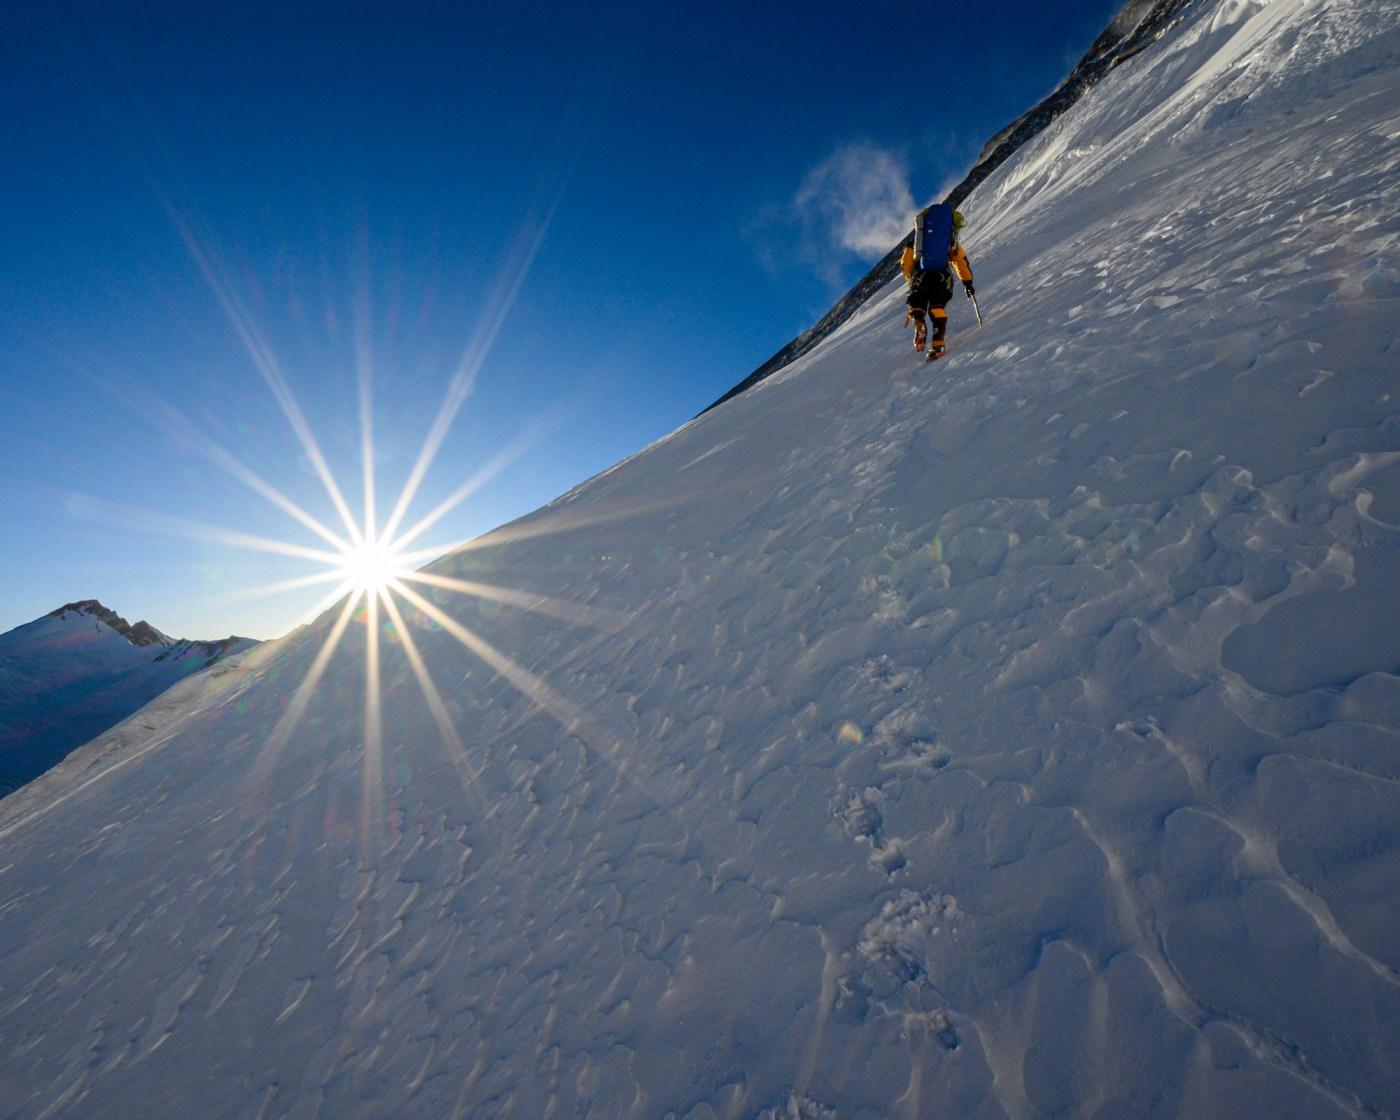 Cory Richards climbing Everest